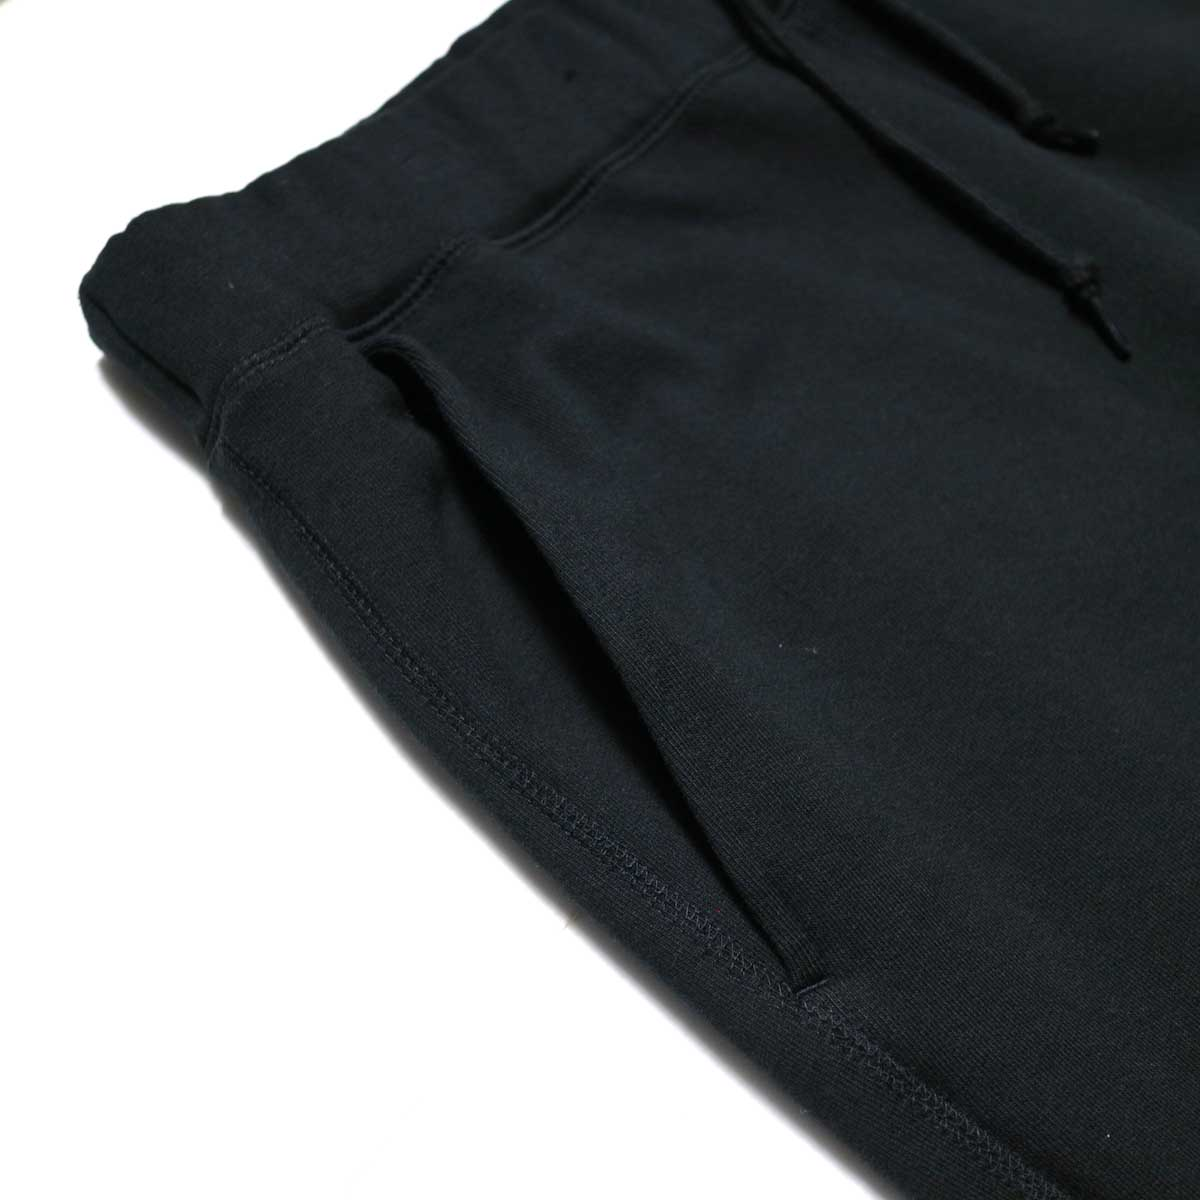 N.HOOLYWOOD / 27RCH-013 Track Pants (Black)ポケット